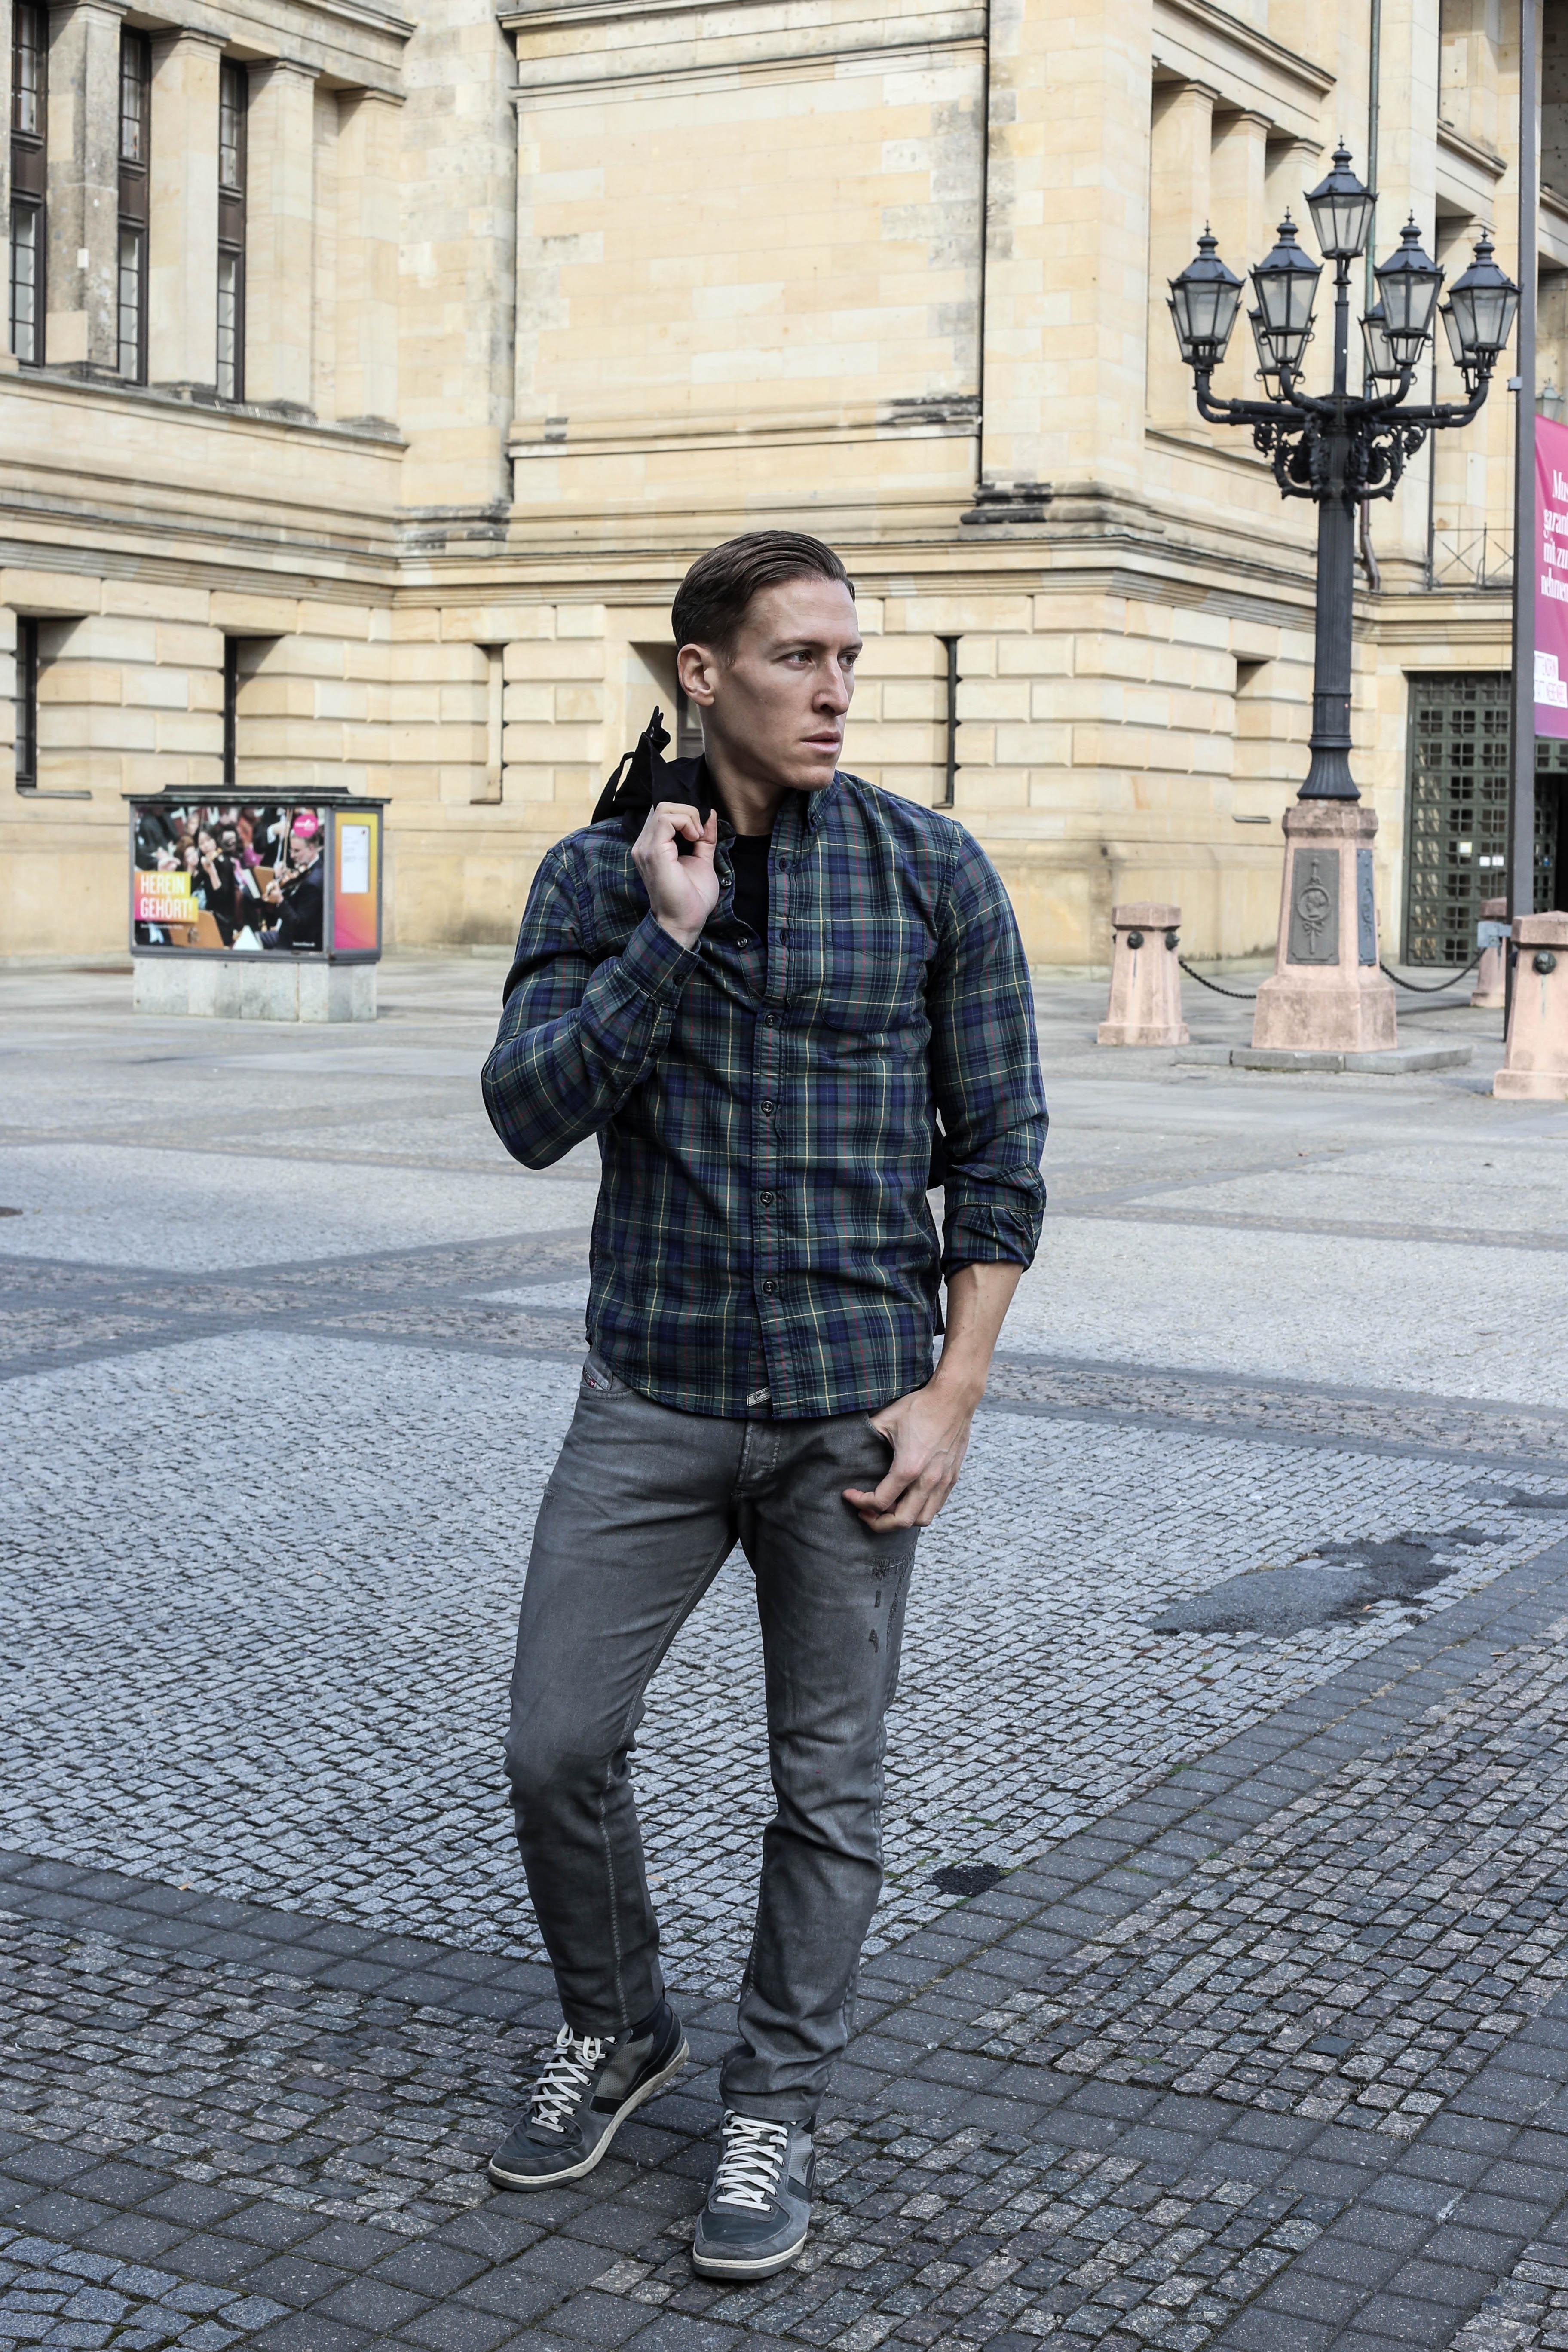 kariertes-hemd-maennerblog-fashionblog-berlin-outfit-graue-jeans_4137